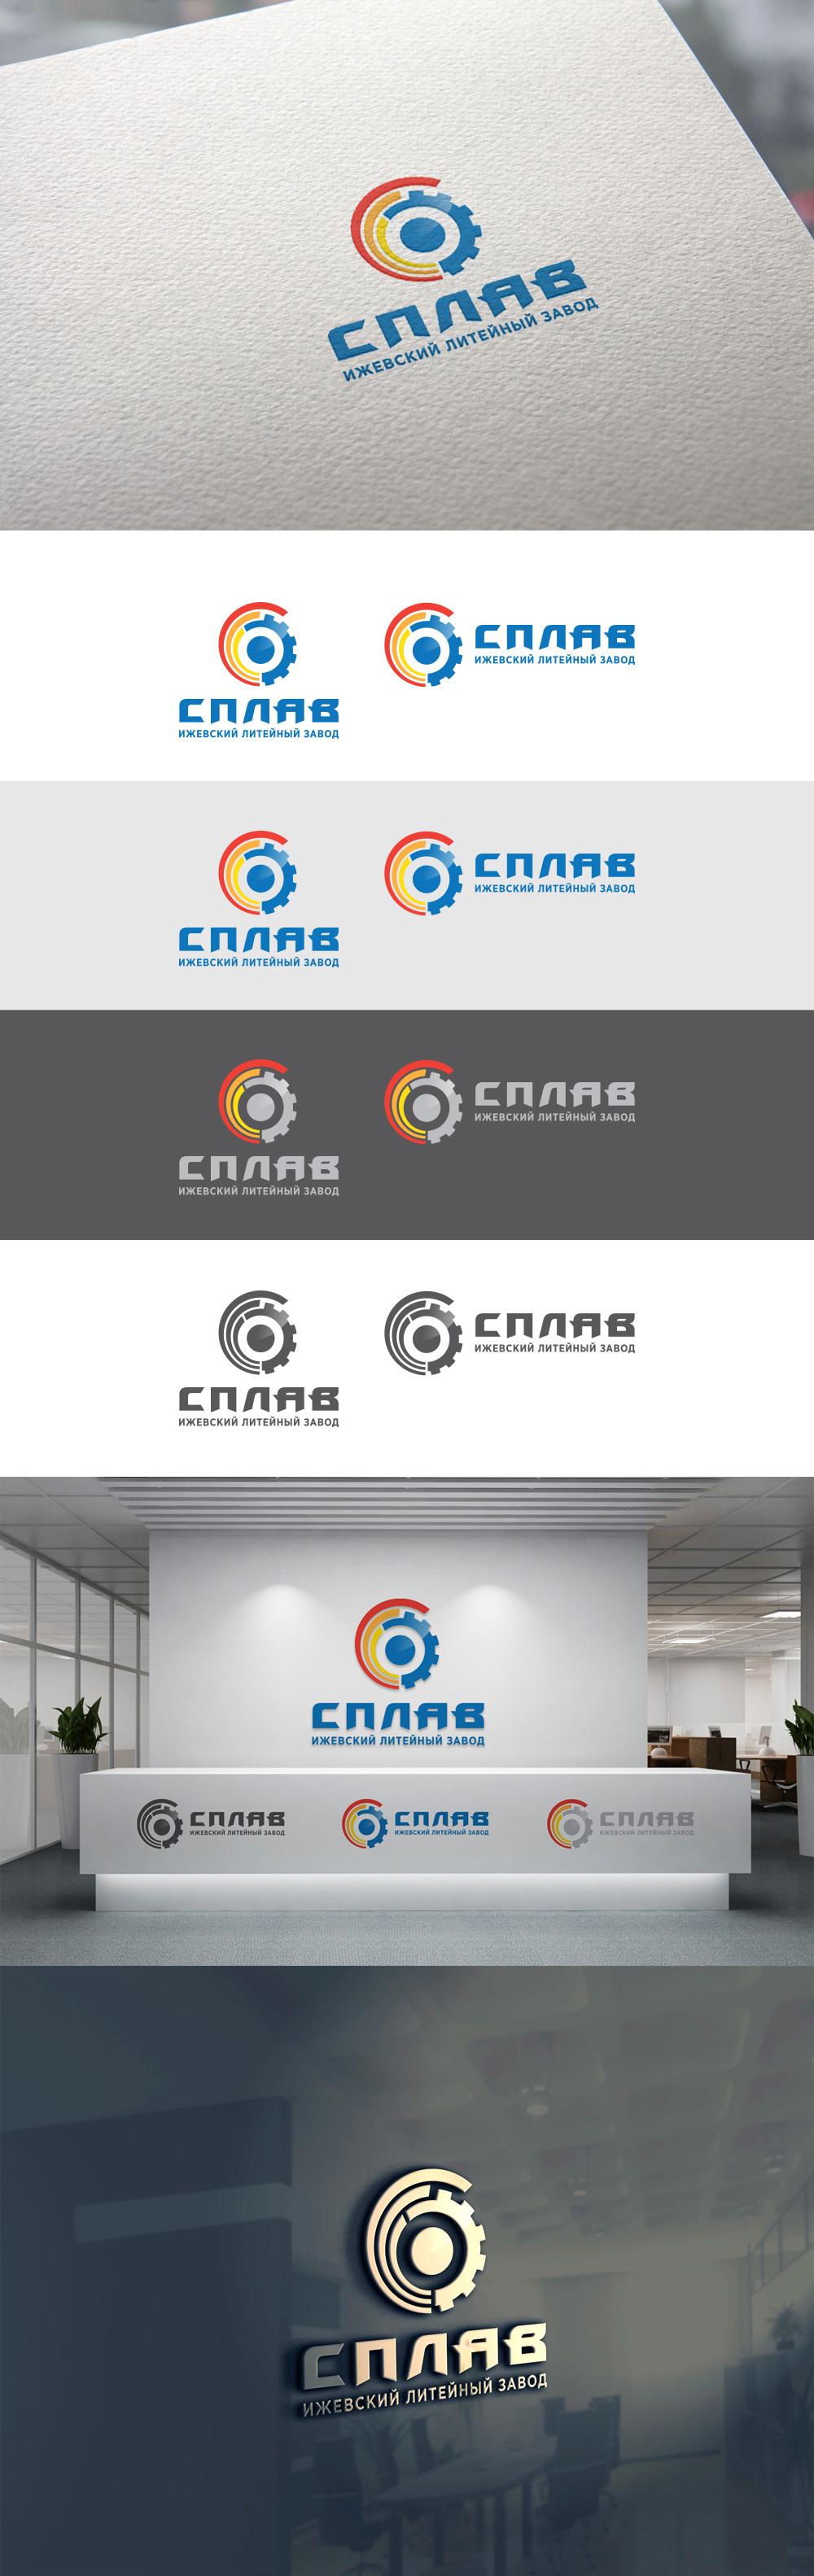 Разработать логотип для литейного завода фото f_6505b12cd2305114.jpg